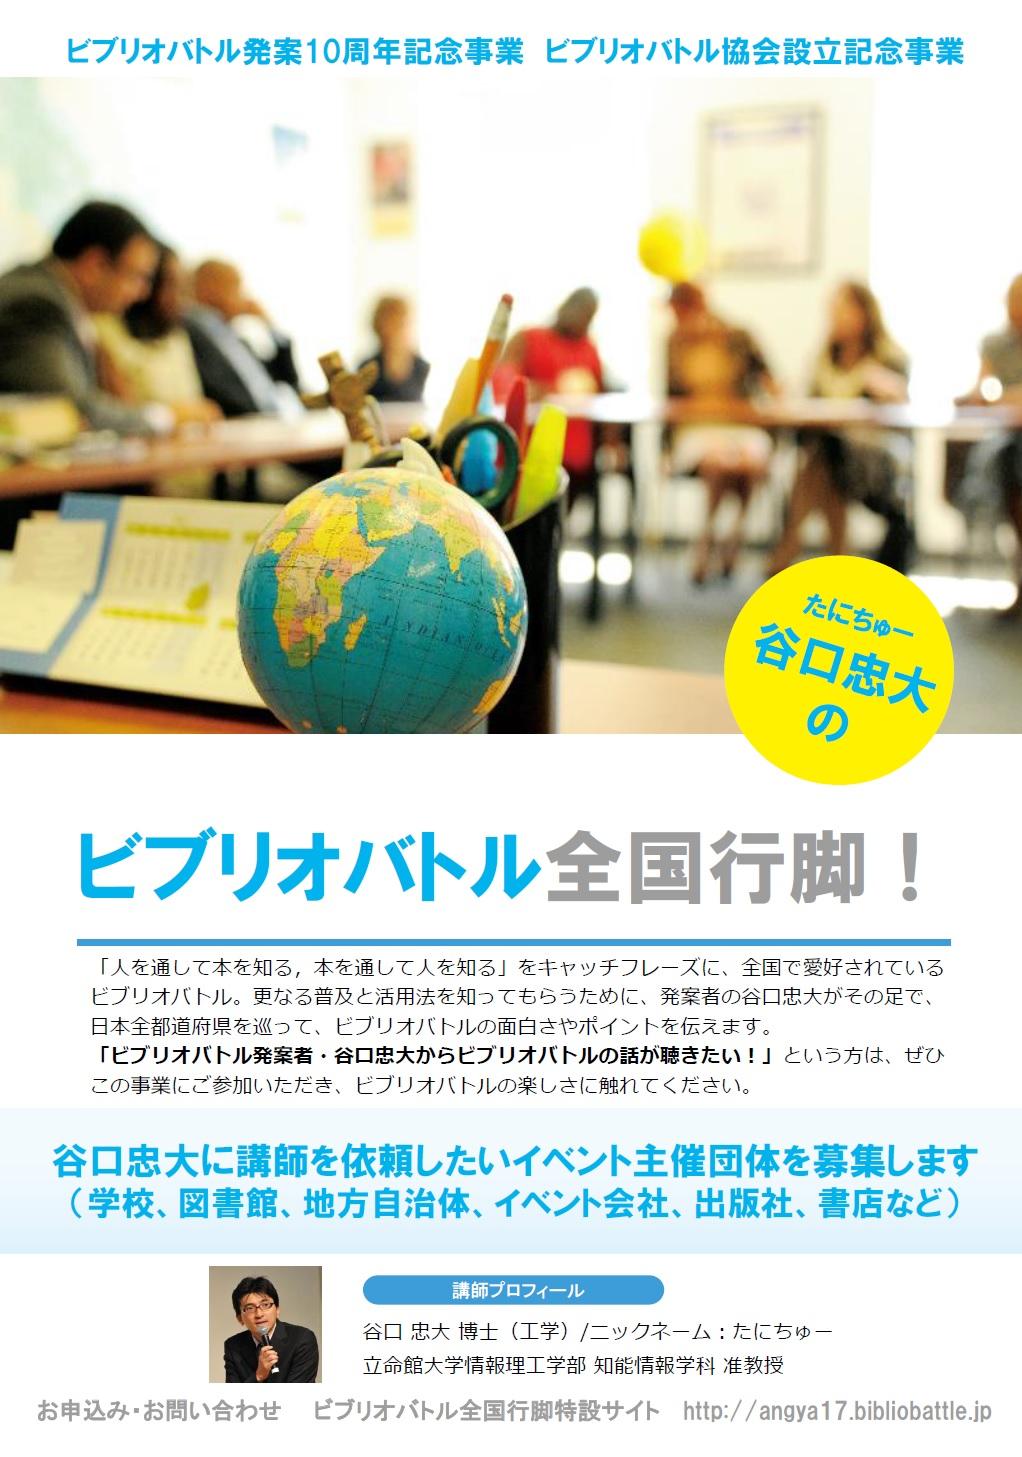 http://angya17.bibliobattle.jp/